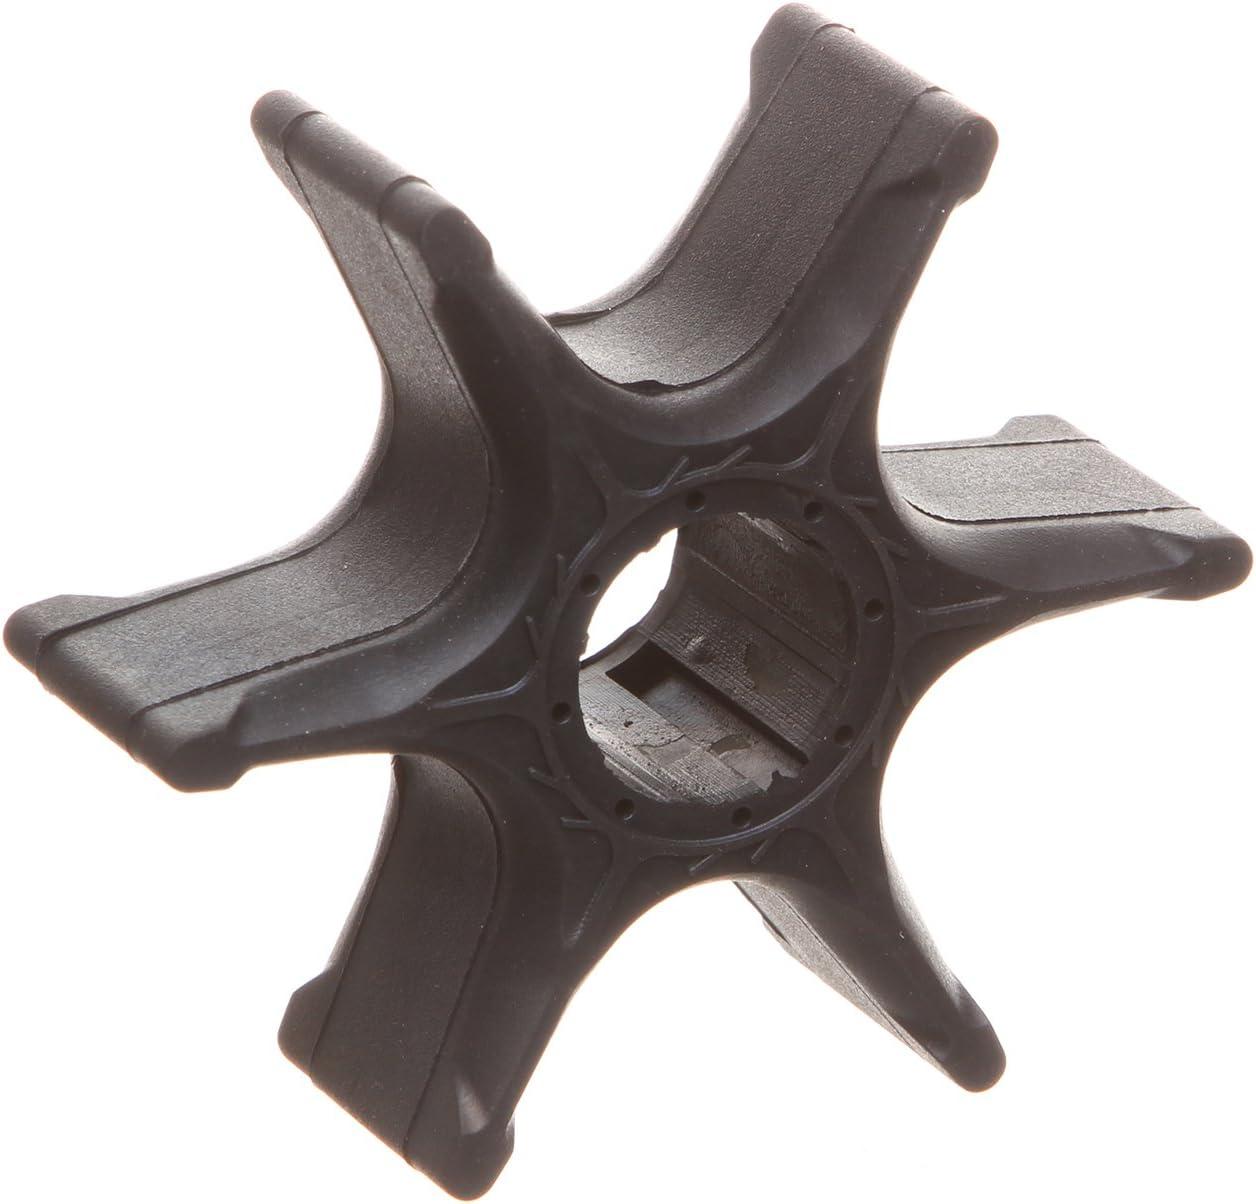 REPLACEMENTKITS.COM Impeller Fits Yamaha 100 115 150 200 225 250 300 HP V4 V6 Outboard Motors Replaces 6E5-44352 & 18-3071